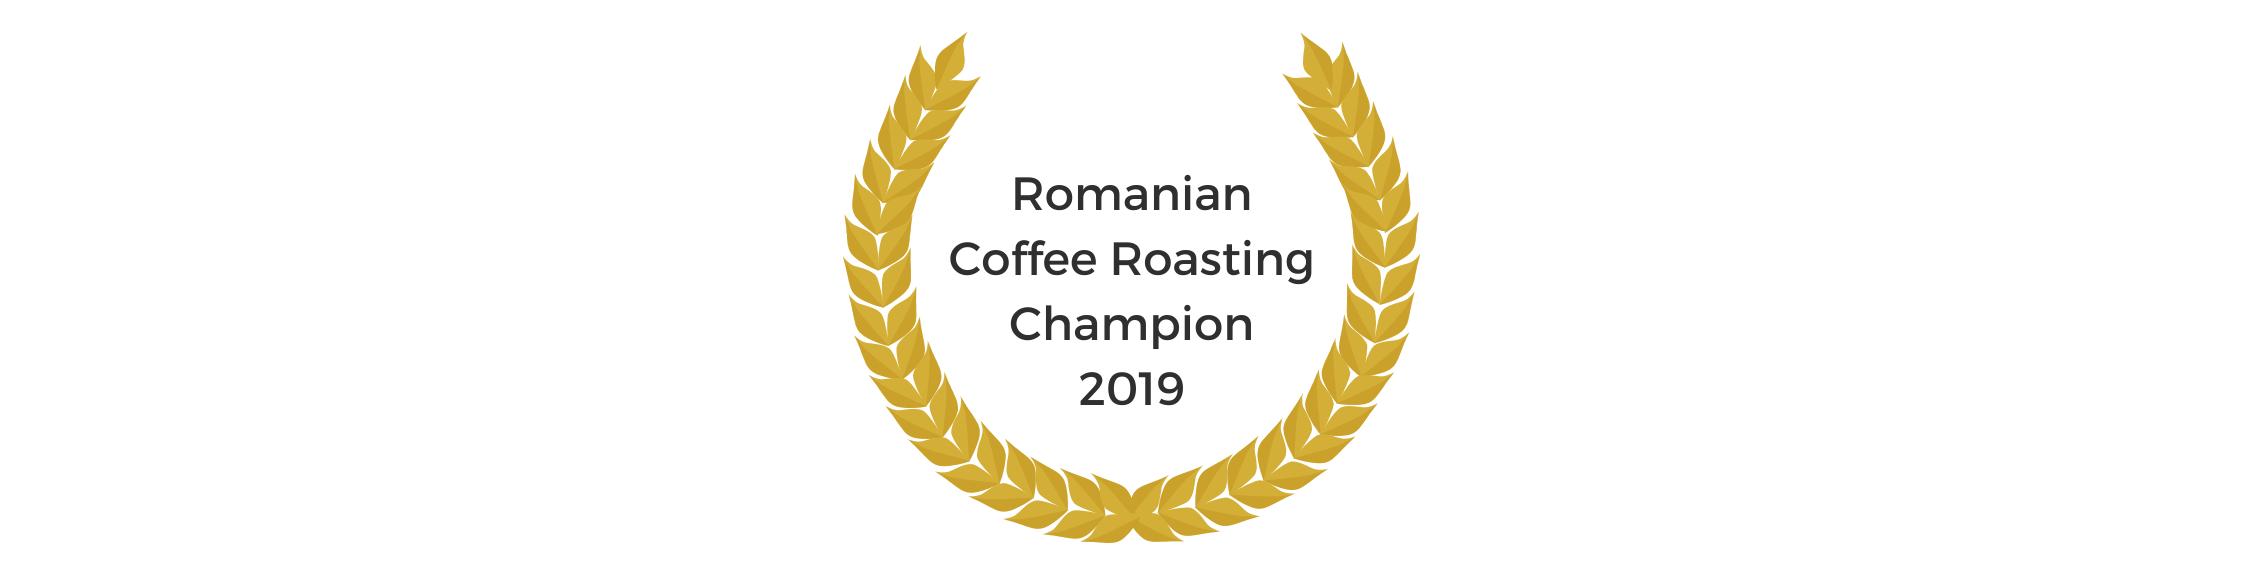 Romanian coffee roasting champion